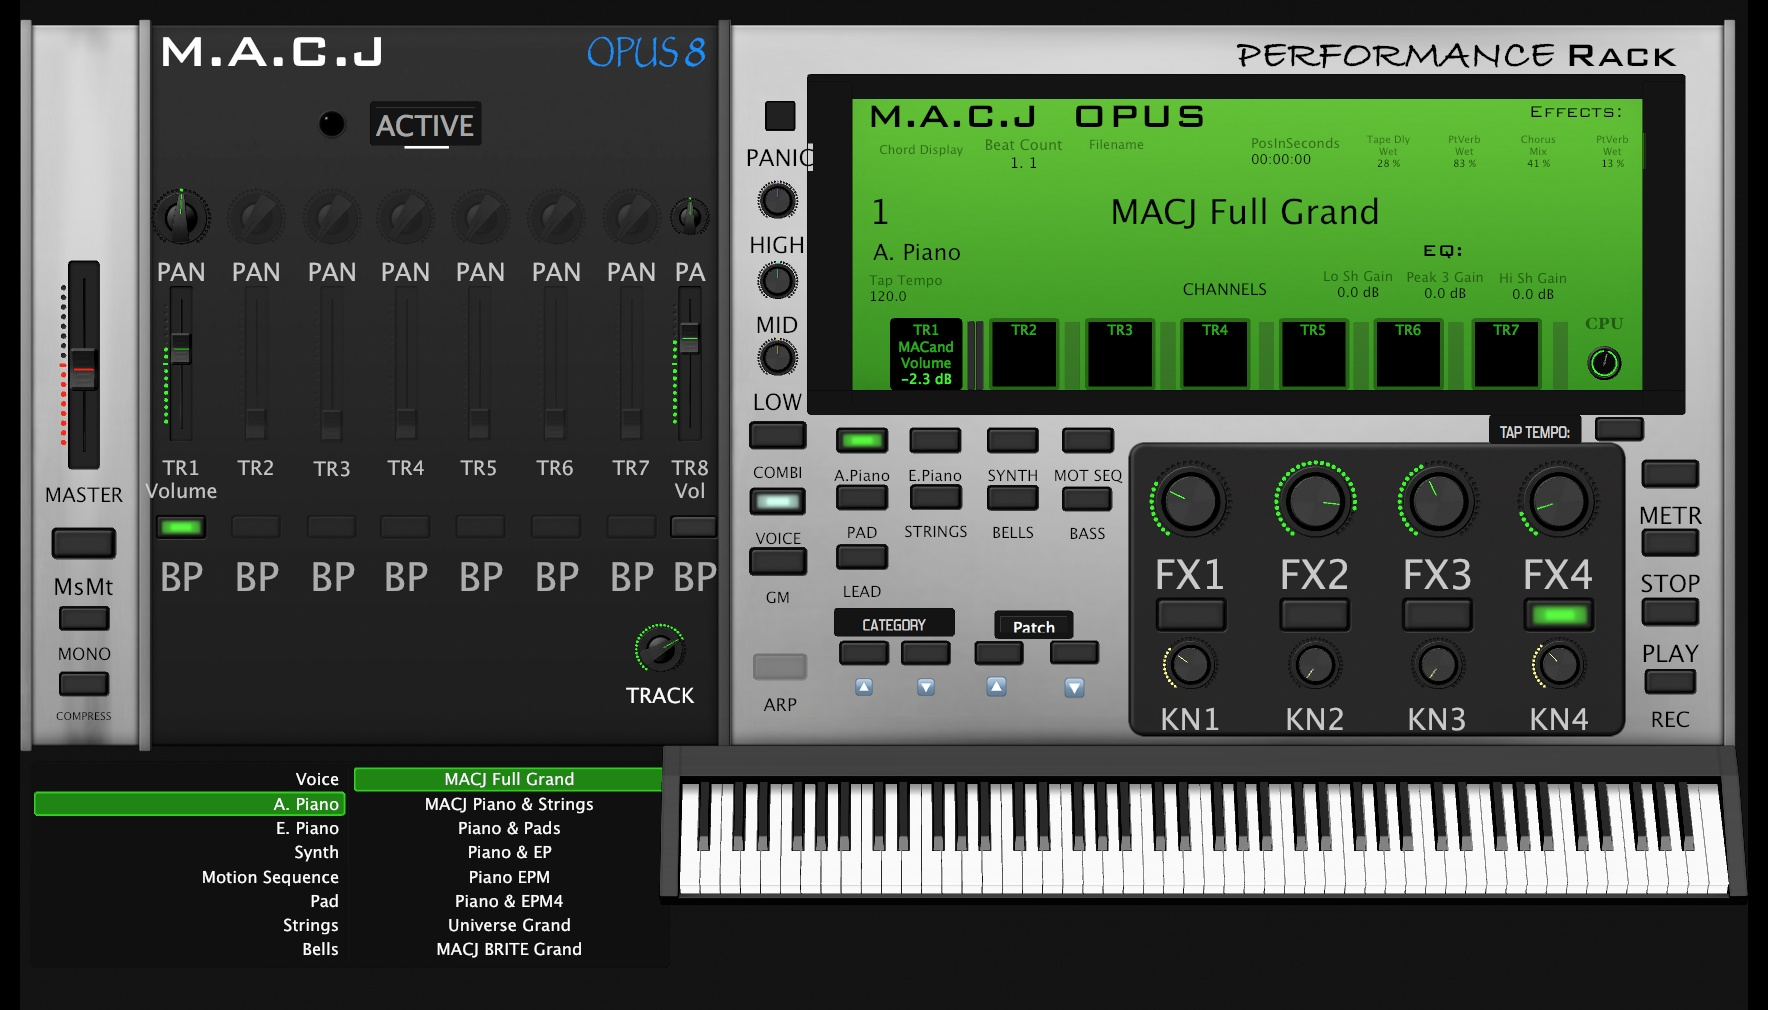 M.A.C.J OPUS 8 Performance Rack